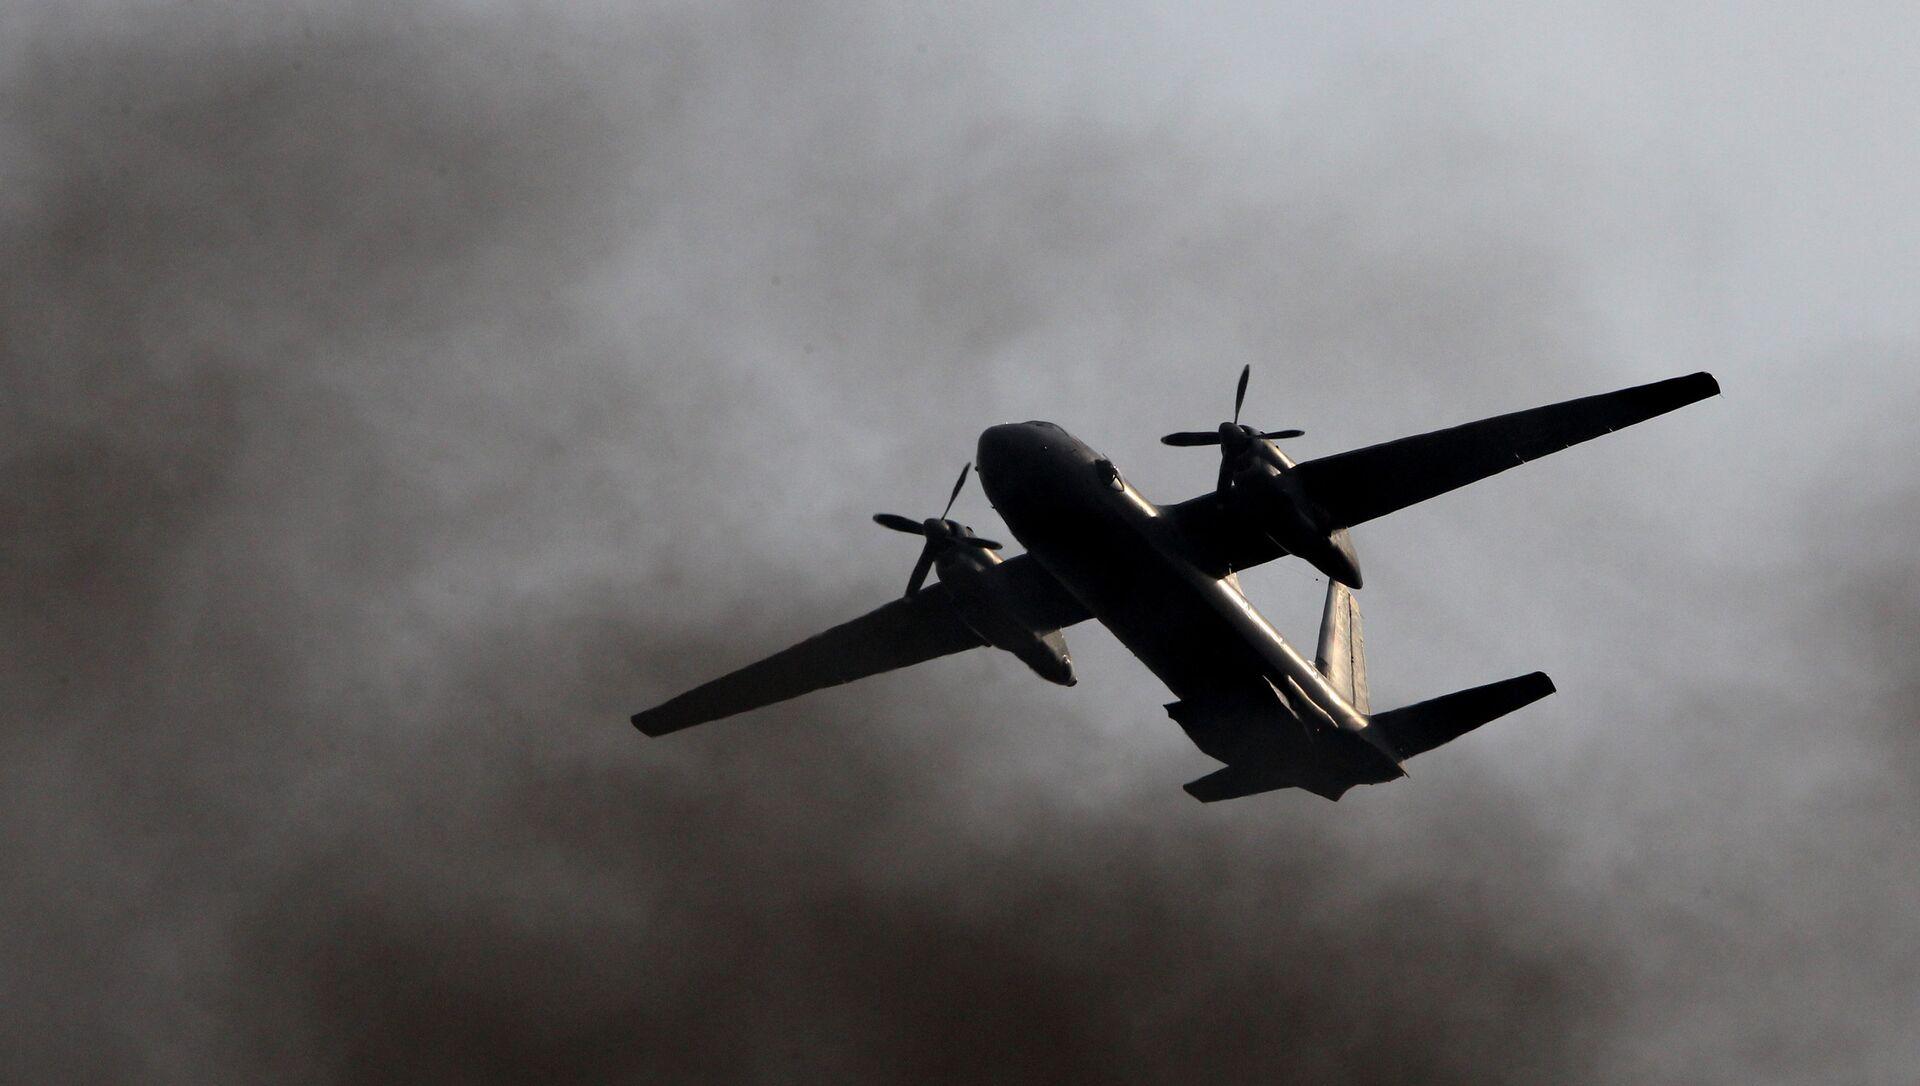 Авион Ан-26 током војних вежби - Sputnik Србија, 1920, 06.07.2021